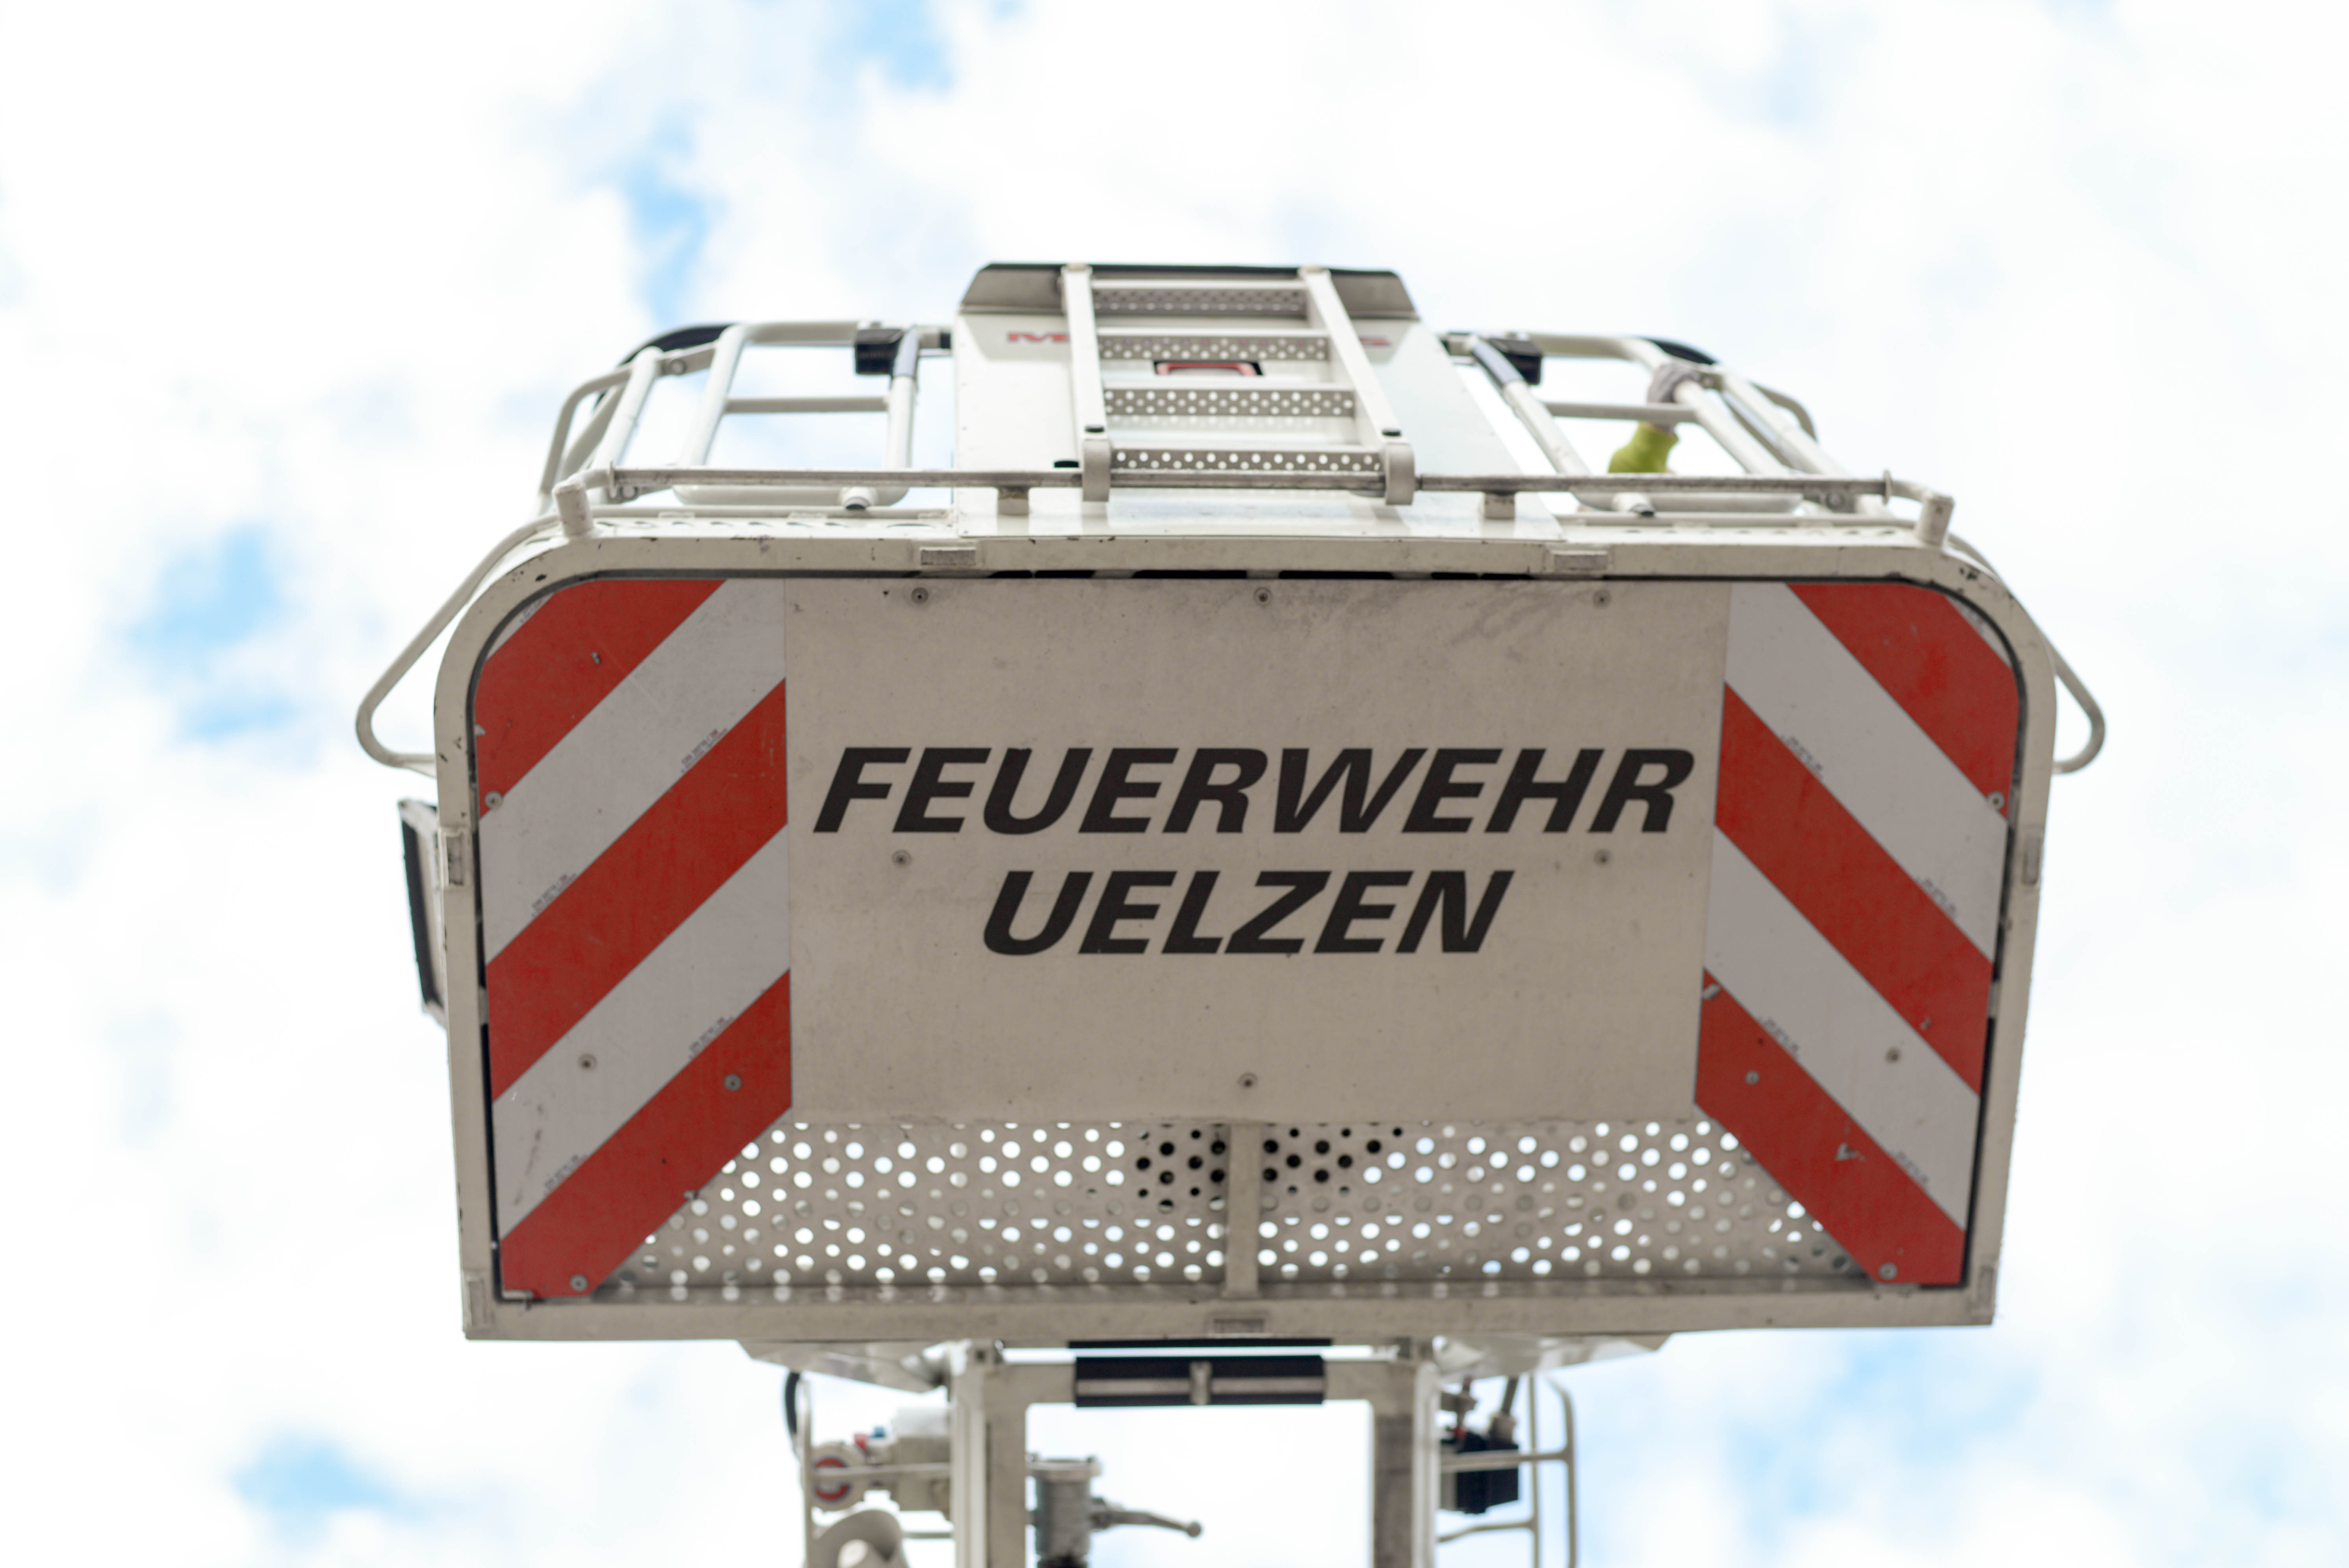 272. F2 - Brennt Hackschnitzellager